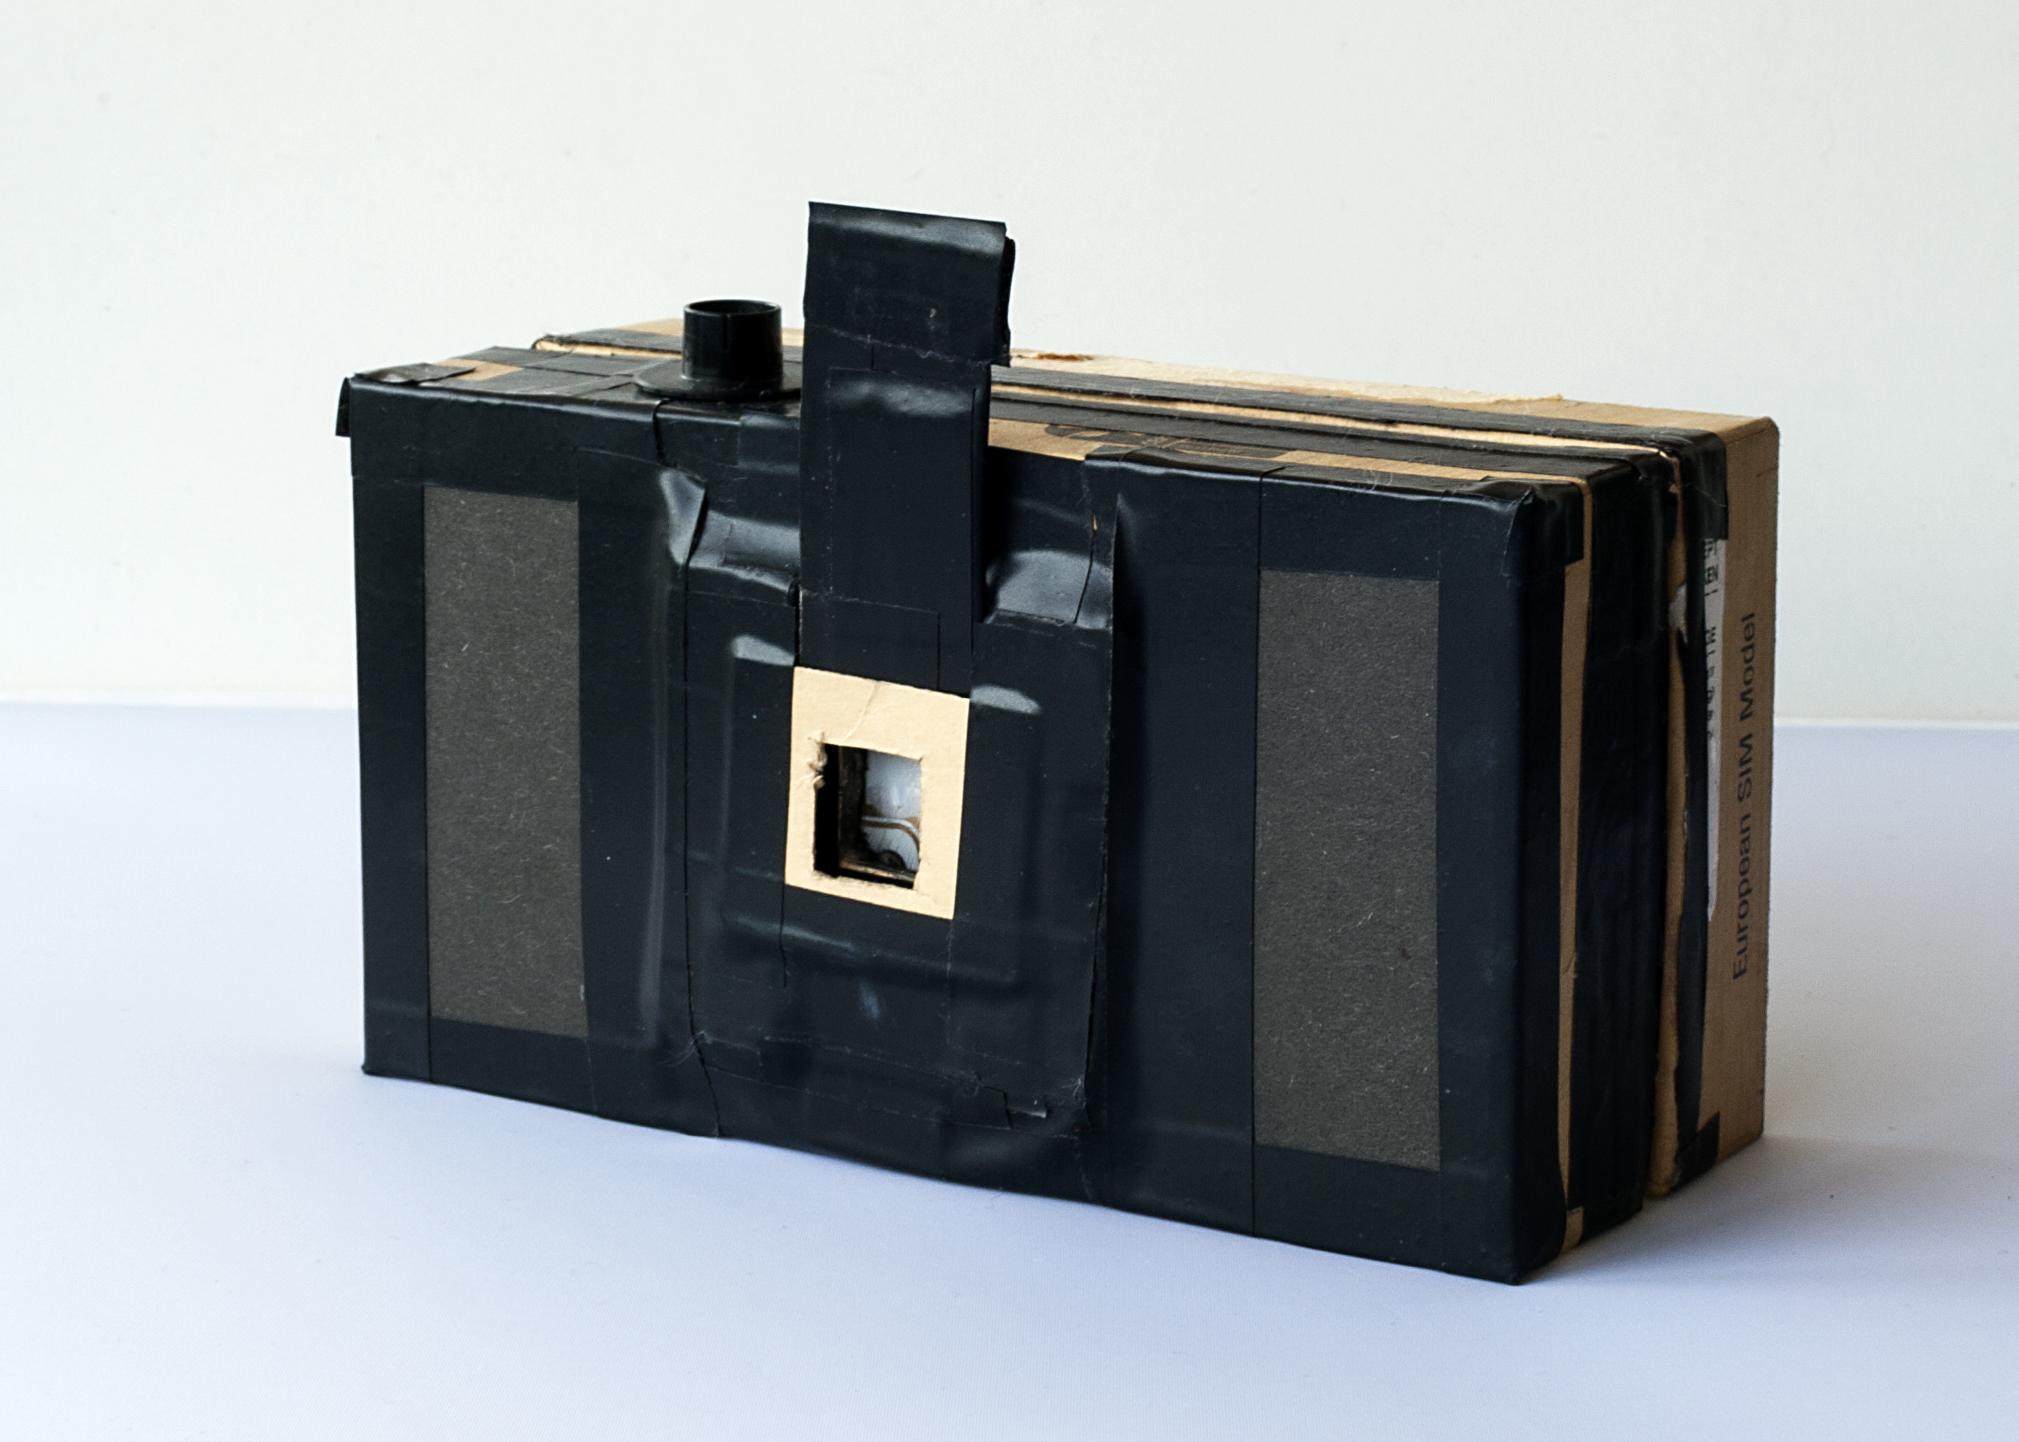 35mm pinhole camera made from a smartphone box.